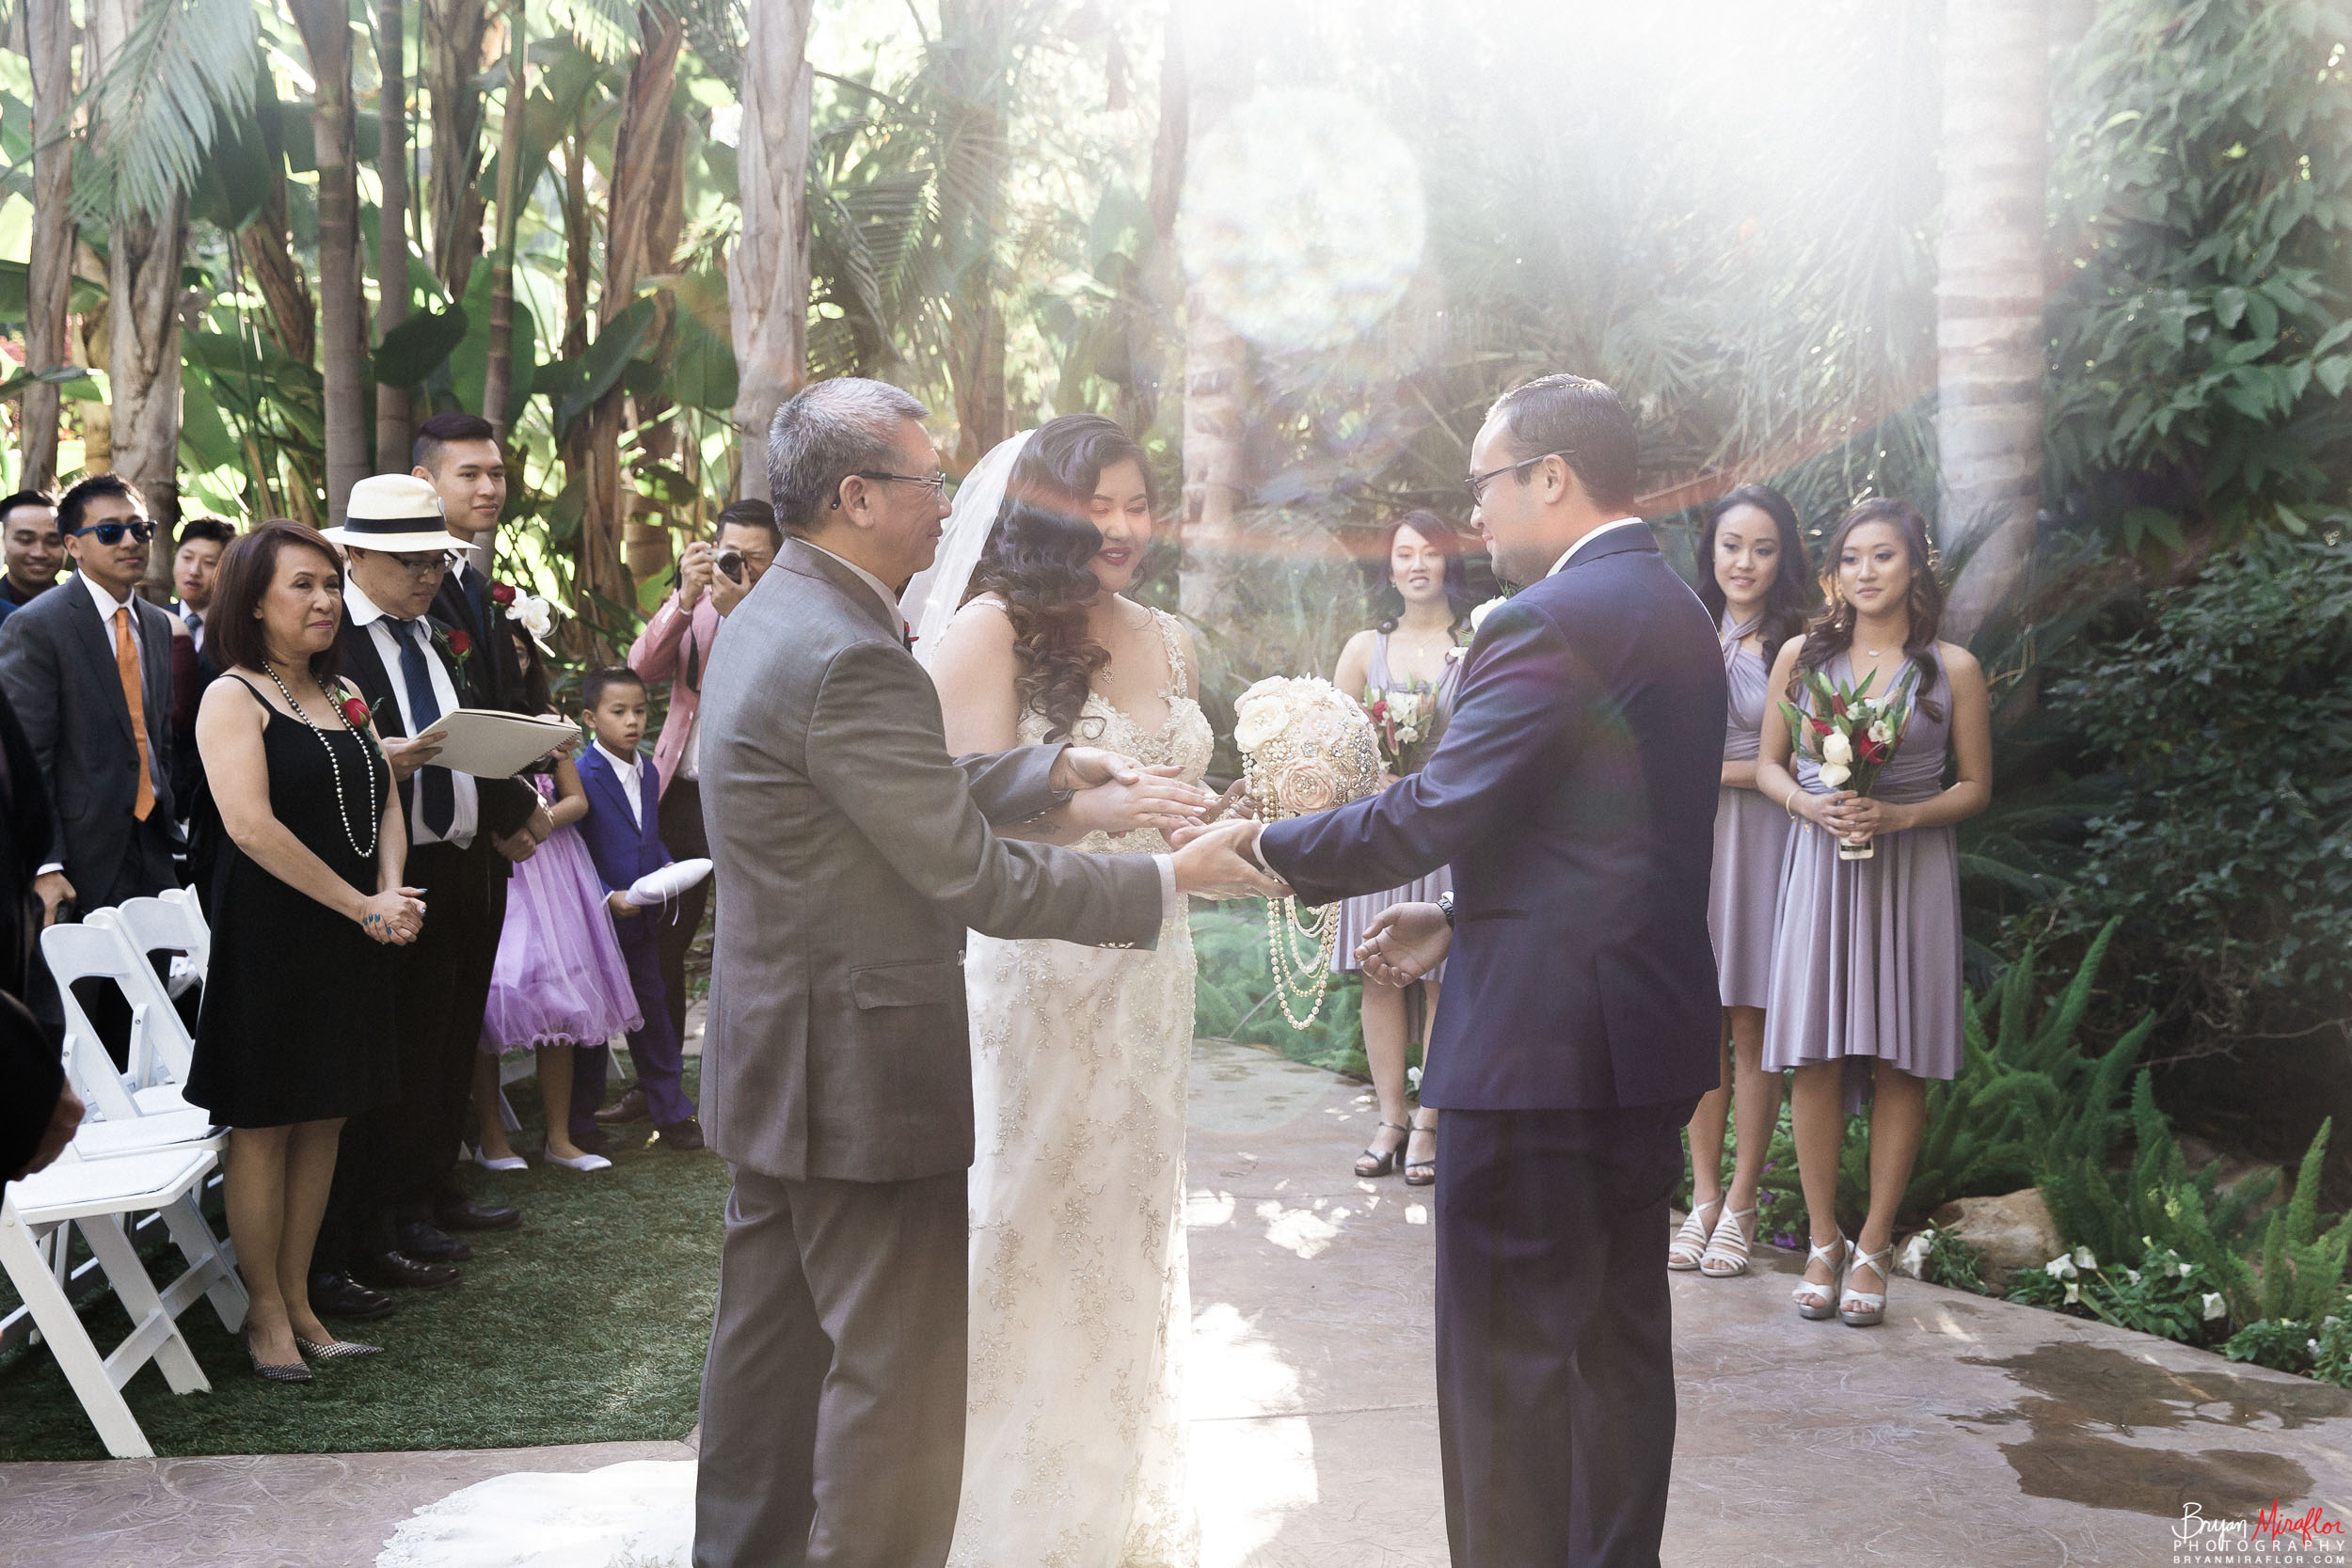 Bryan-Miraflor-Photography-Hannah-Jonathan-Married-Grand-Traditions-Estate-Gardens-Fallbrook-20171222-096.jpg